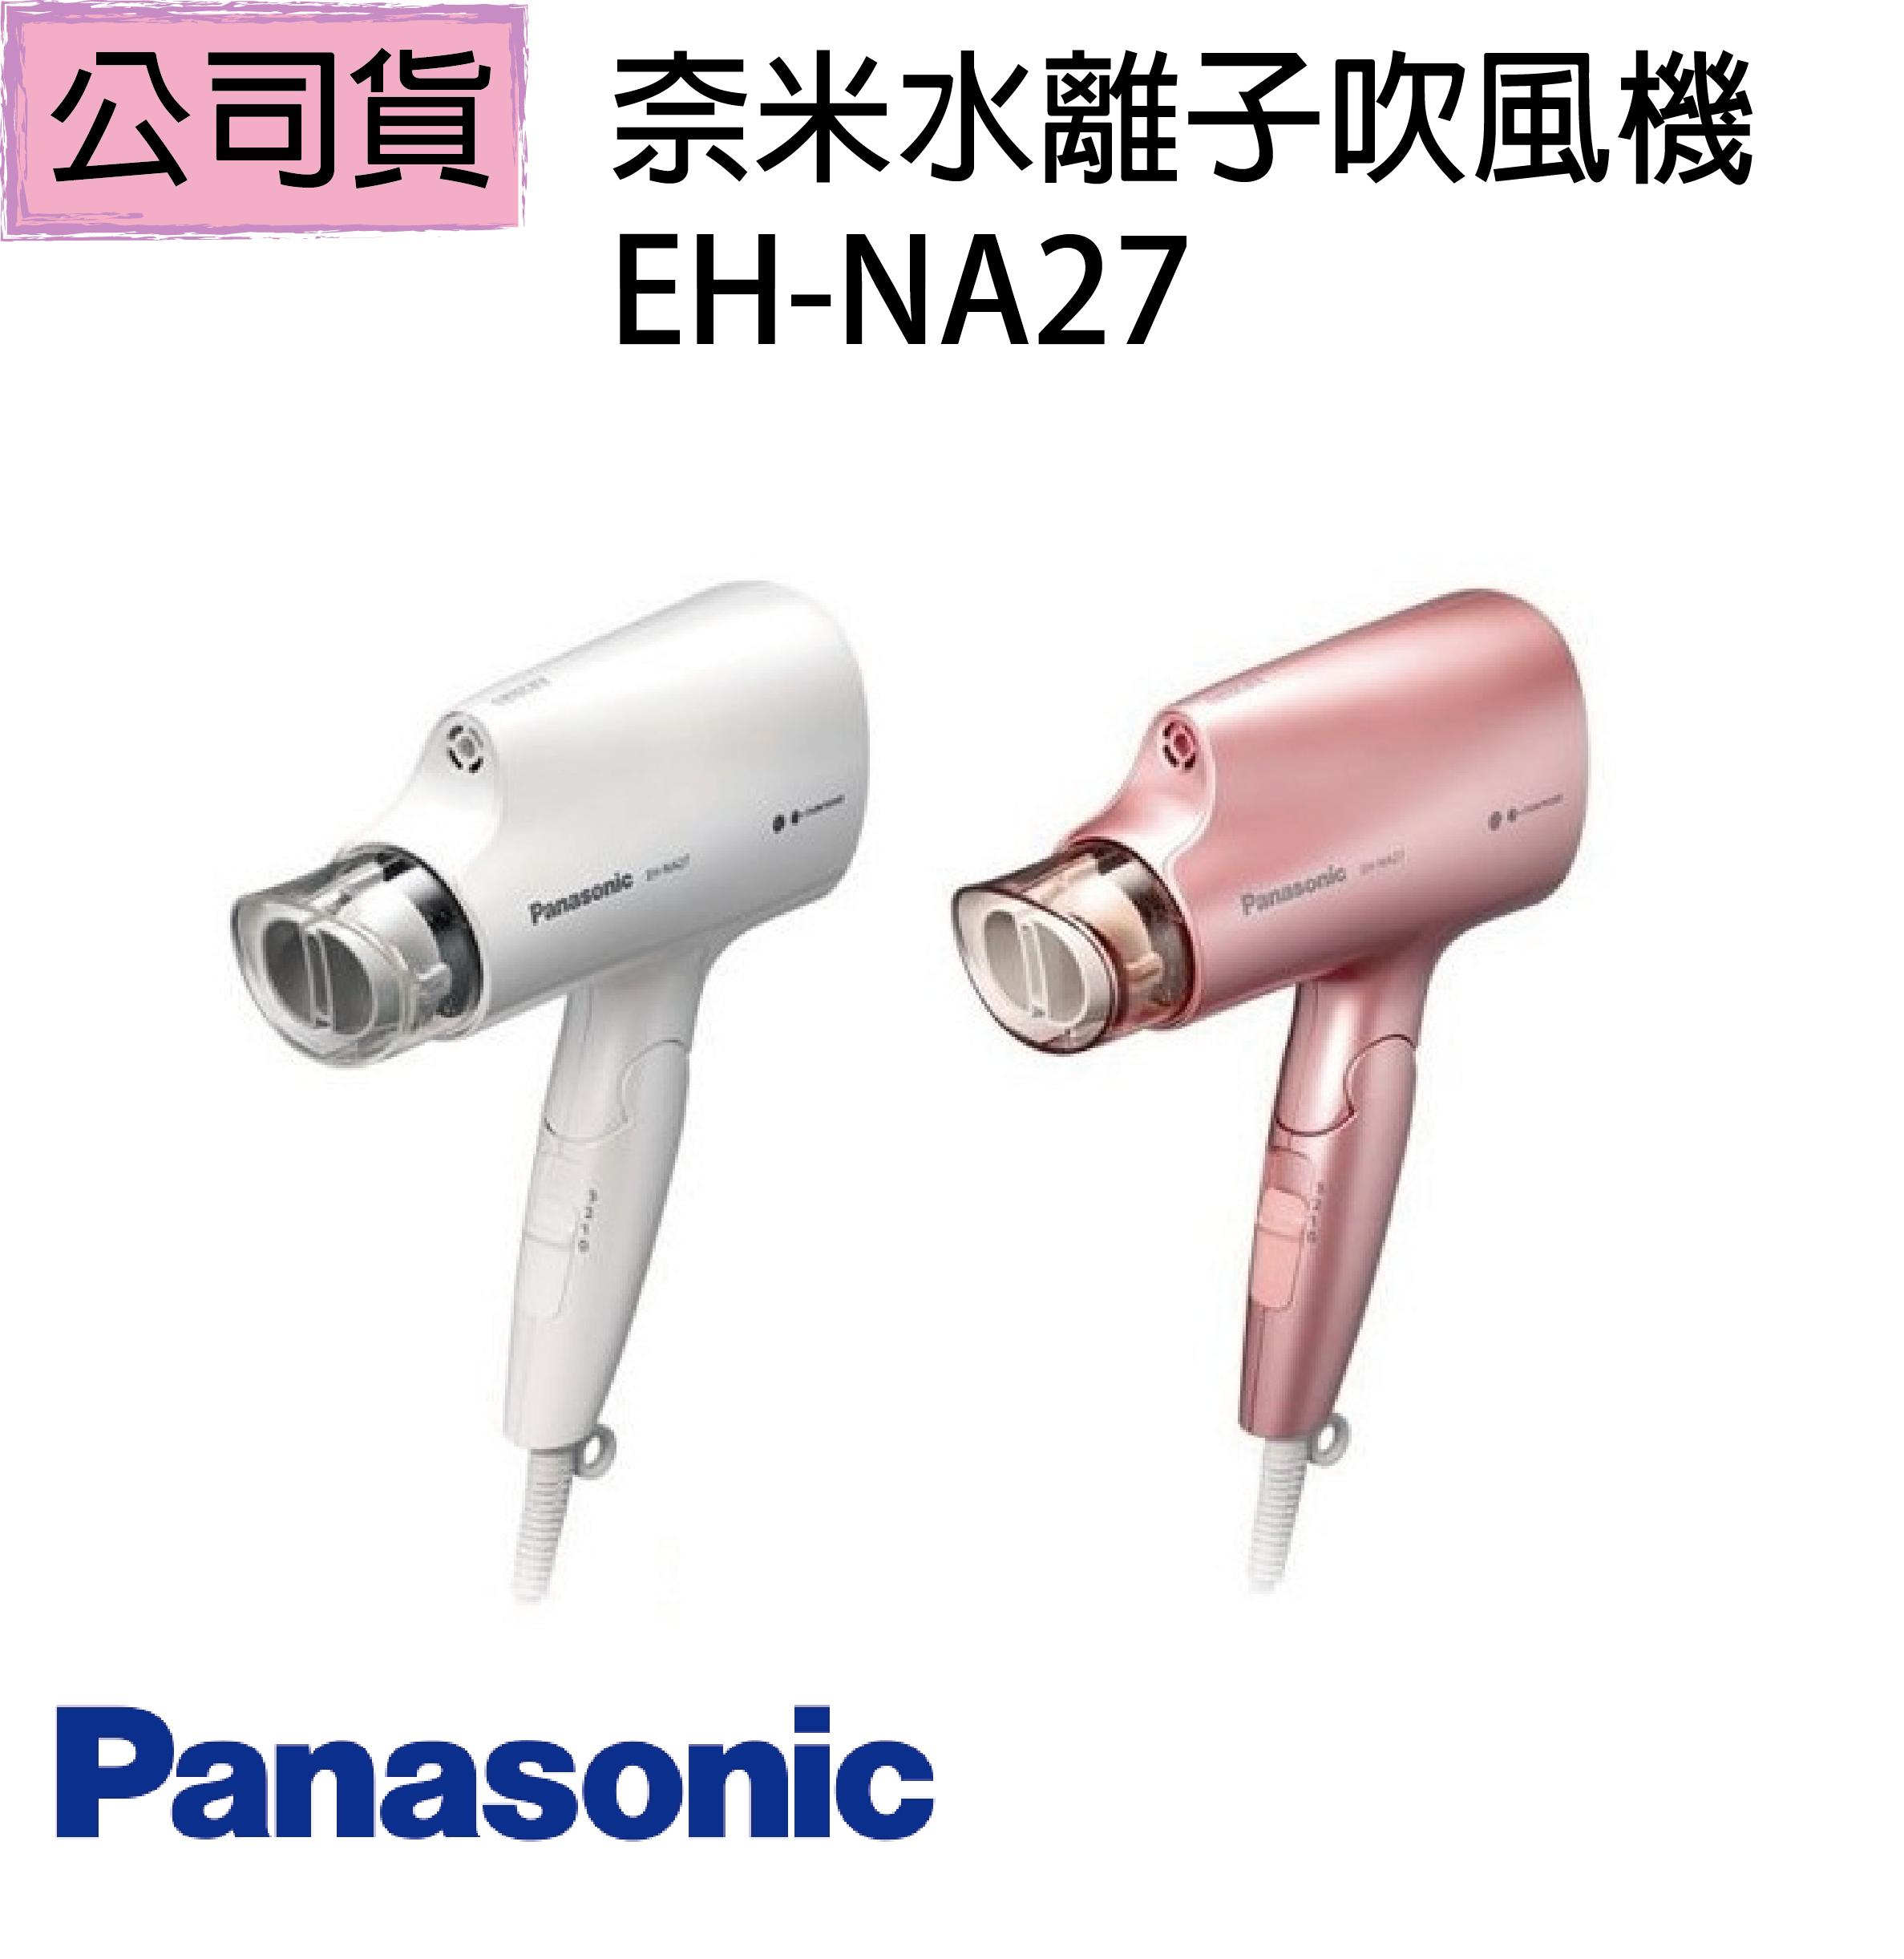 【Panasonic】國際牌 奈米水離子吹風機EH-NA27 玫瑰粉/靚亮白(公司貨)